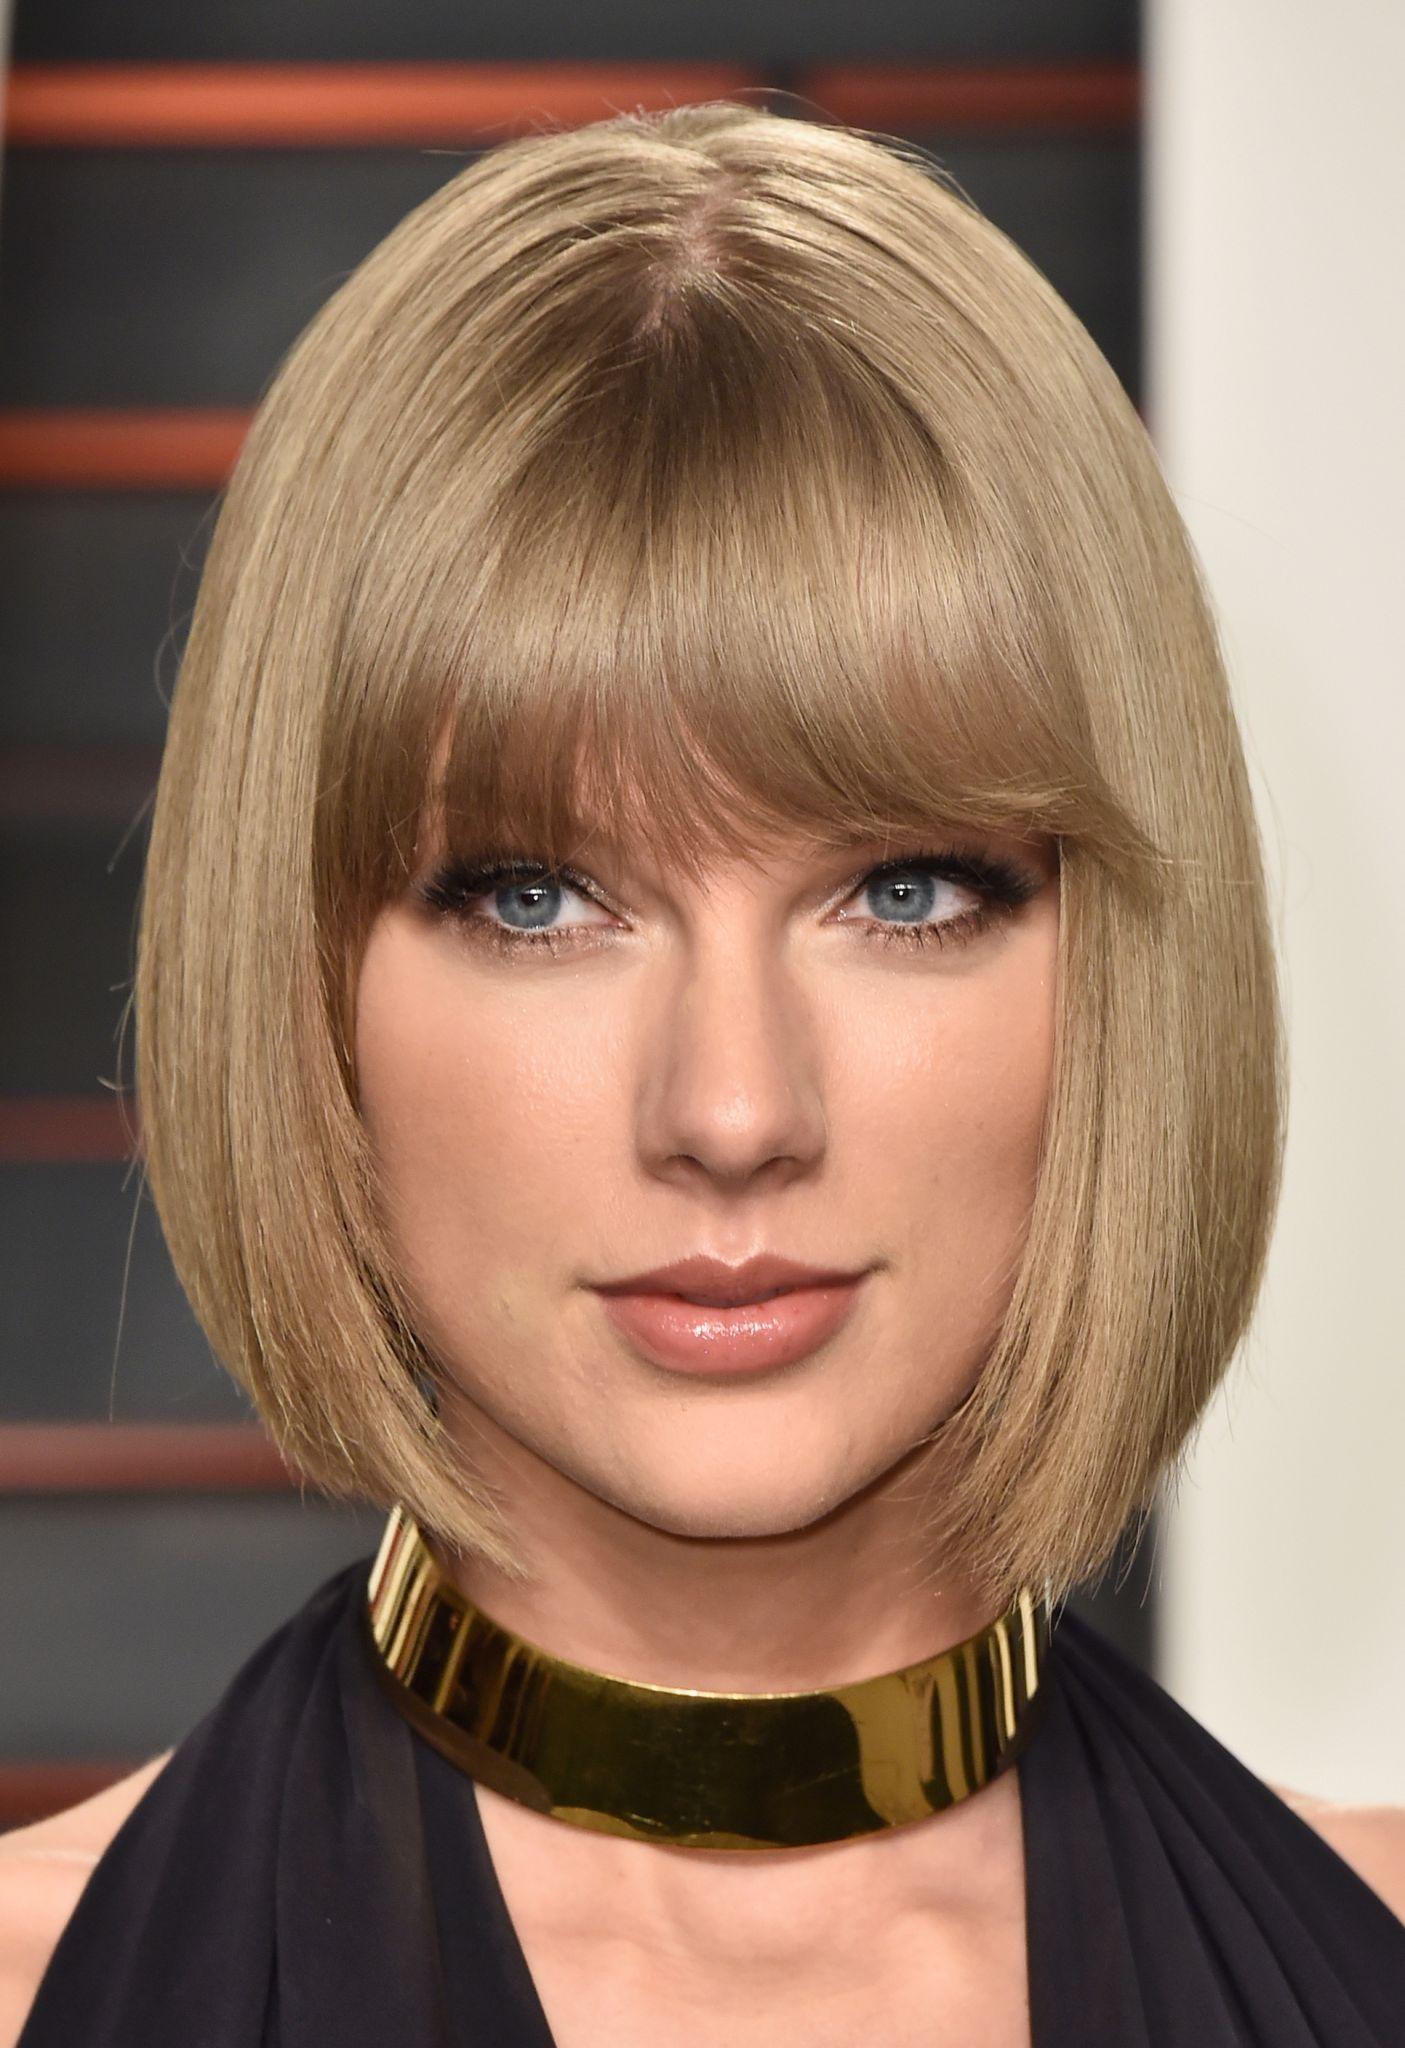 Taylor Swift cabelo liso com franja